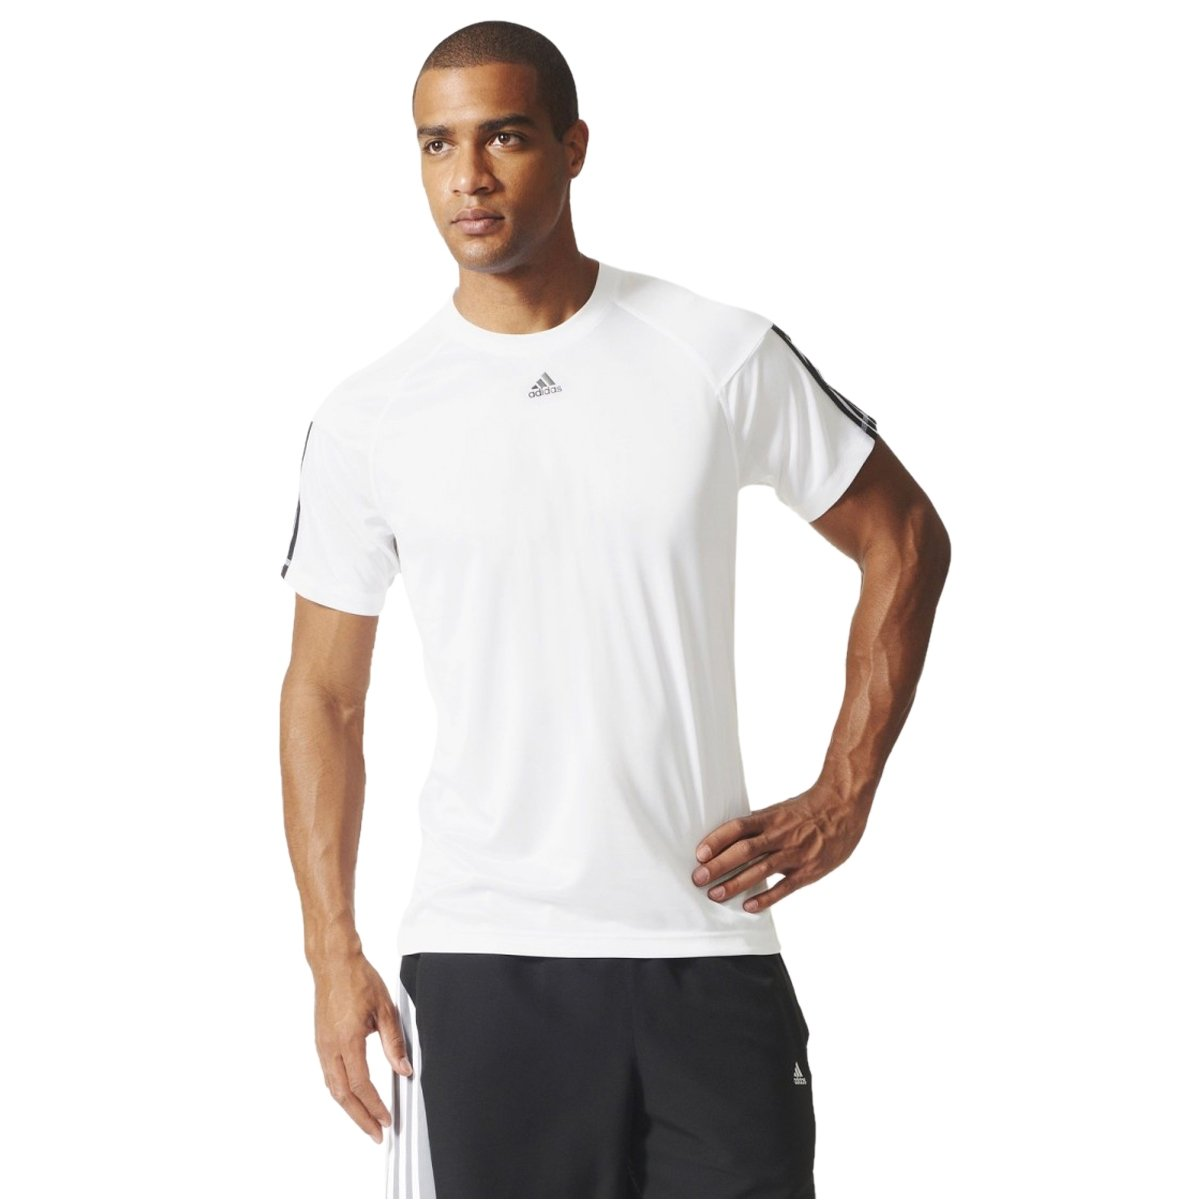 Bizz Store - Camiseta Masculina Adidas Base 3S Branca b94406a936244